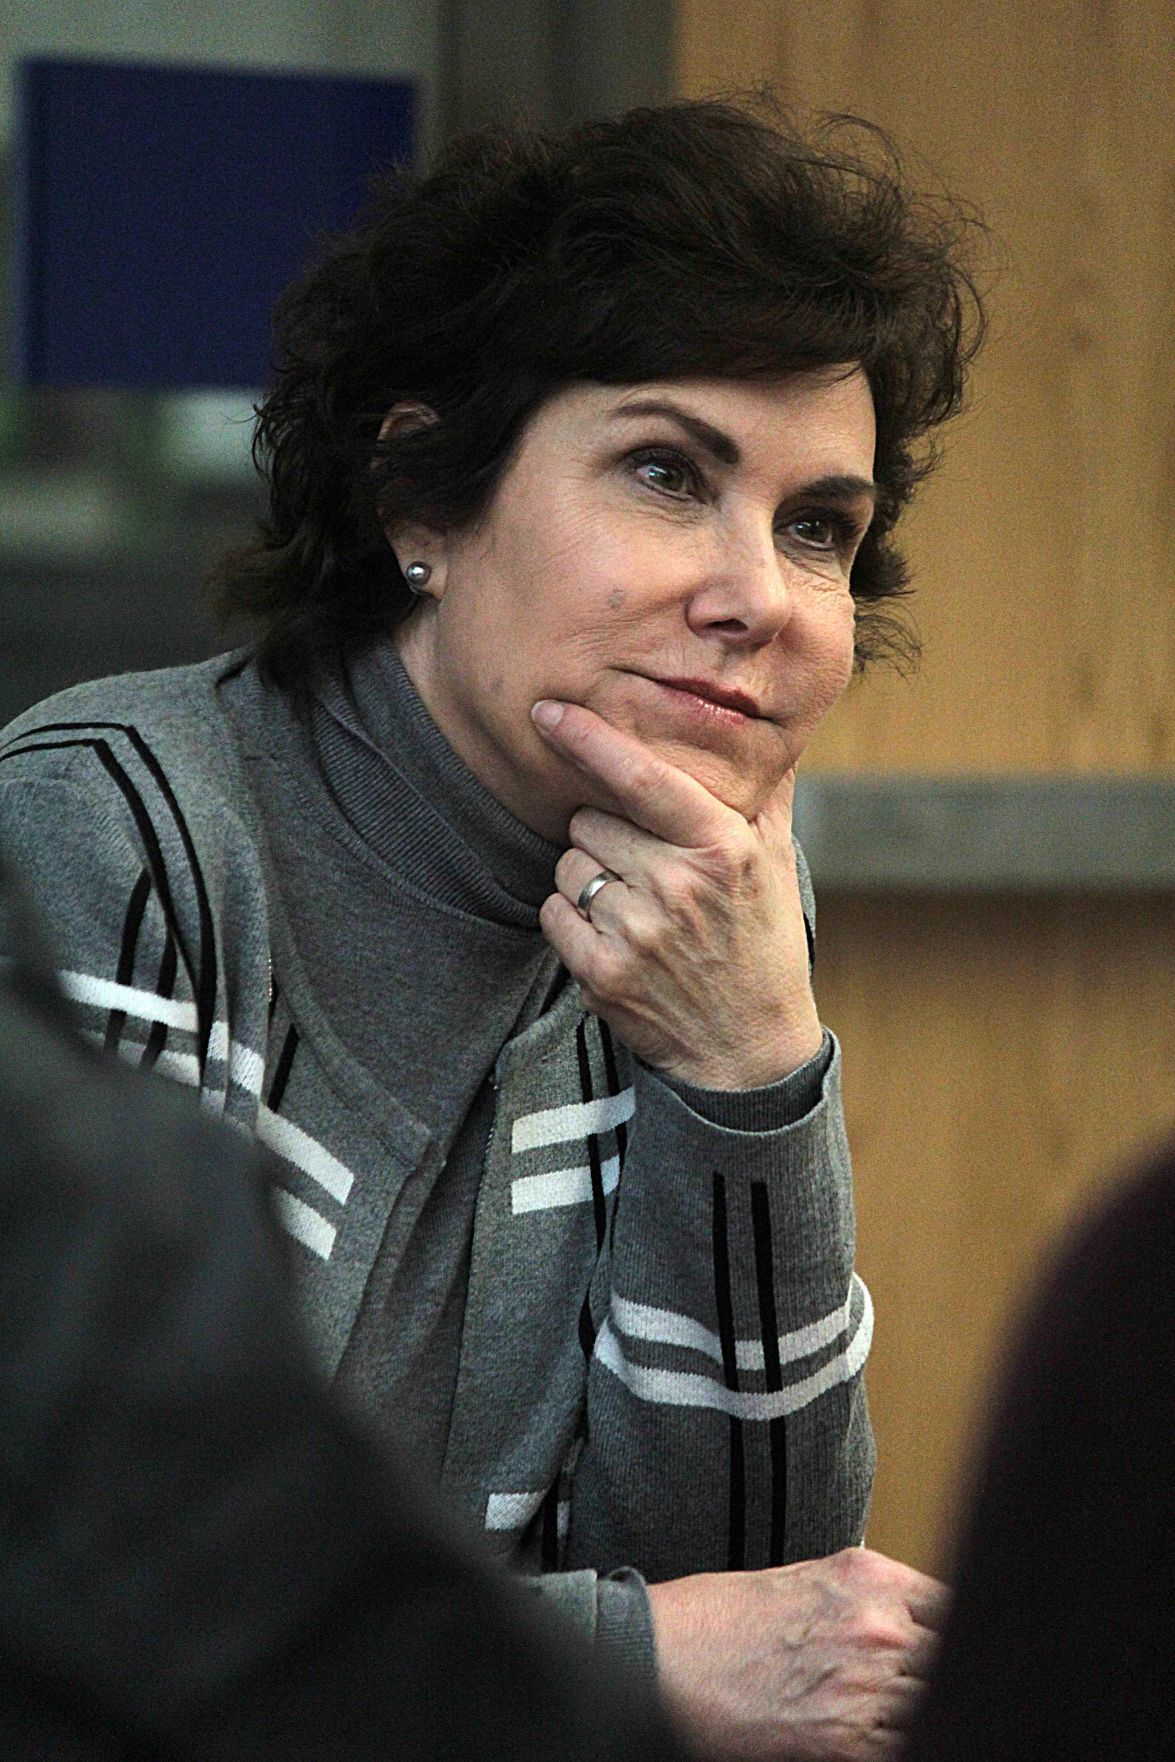 U.S. Senator Jacky Rosen